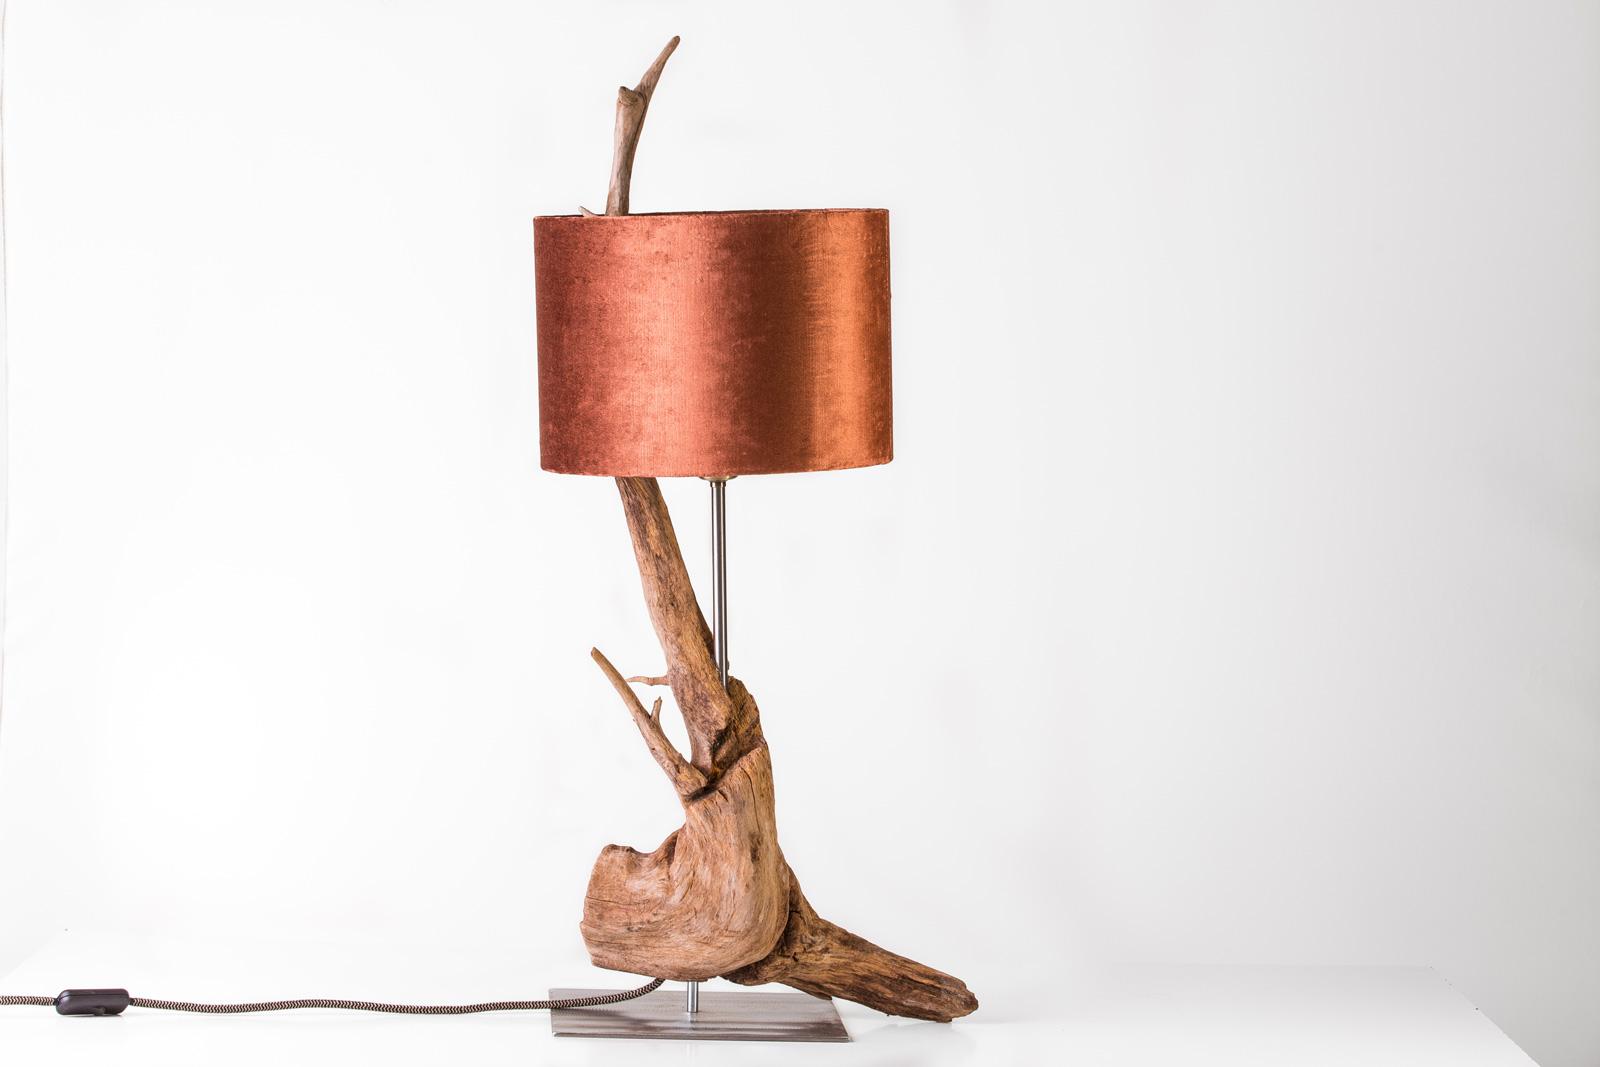 Jedes Stück ein Unikat: Lenzholz-Lampe